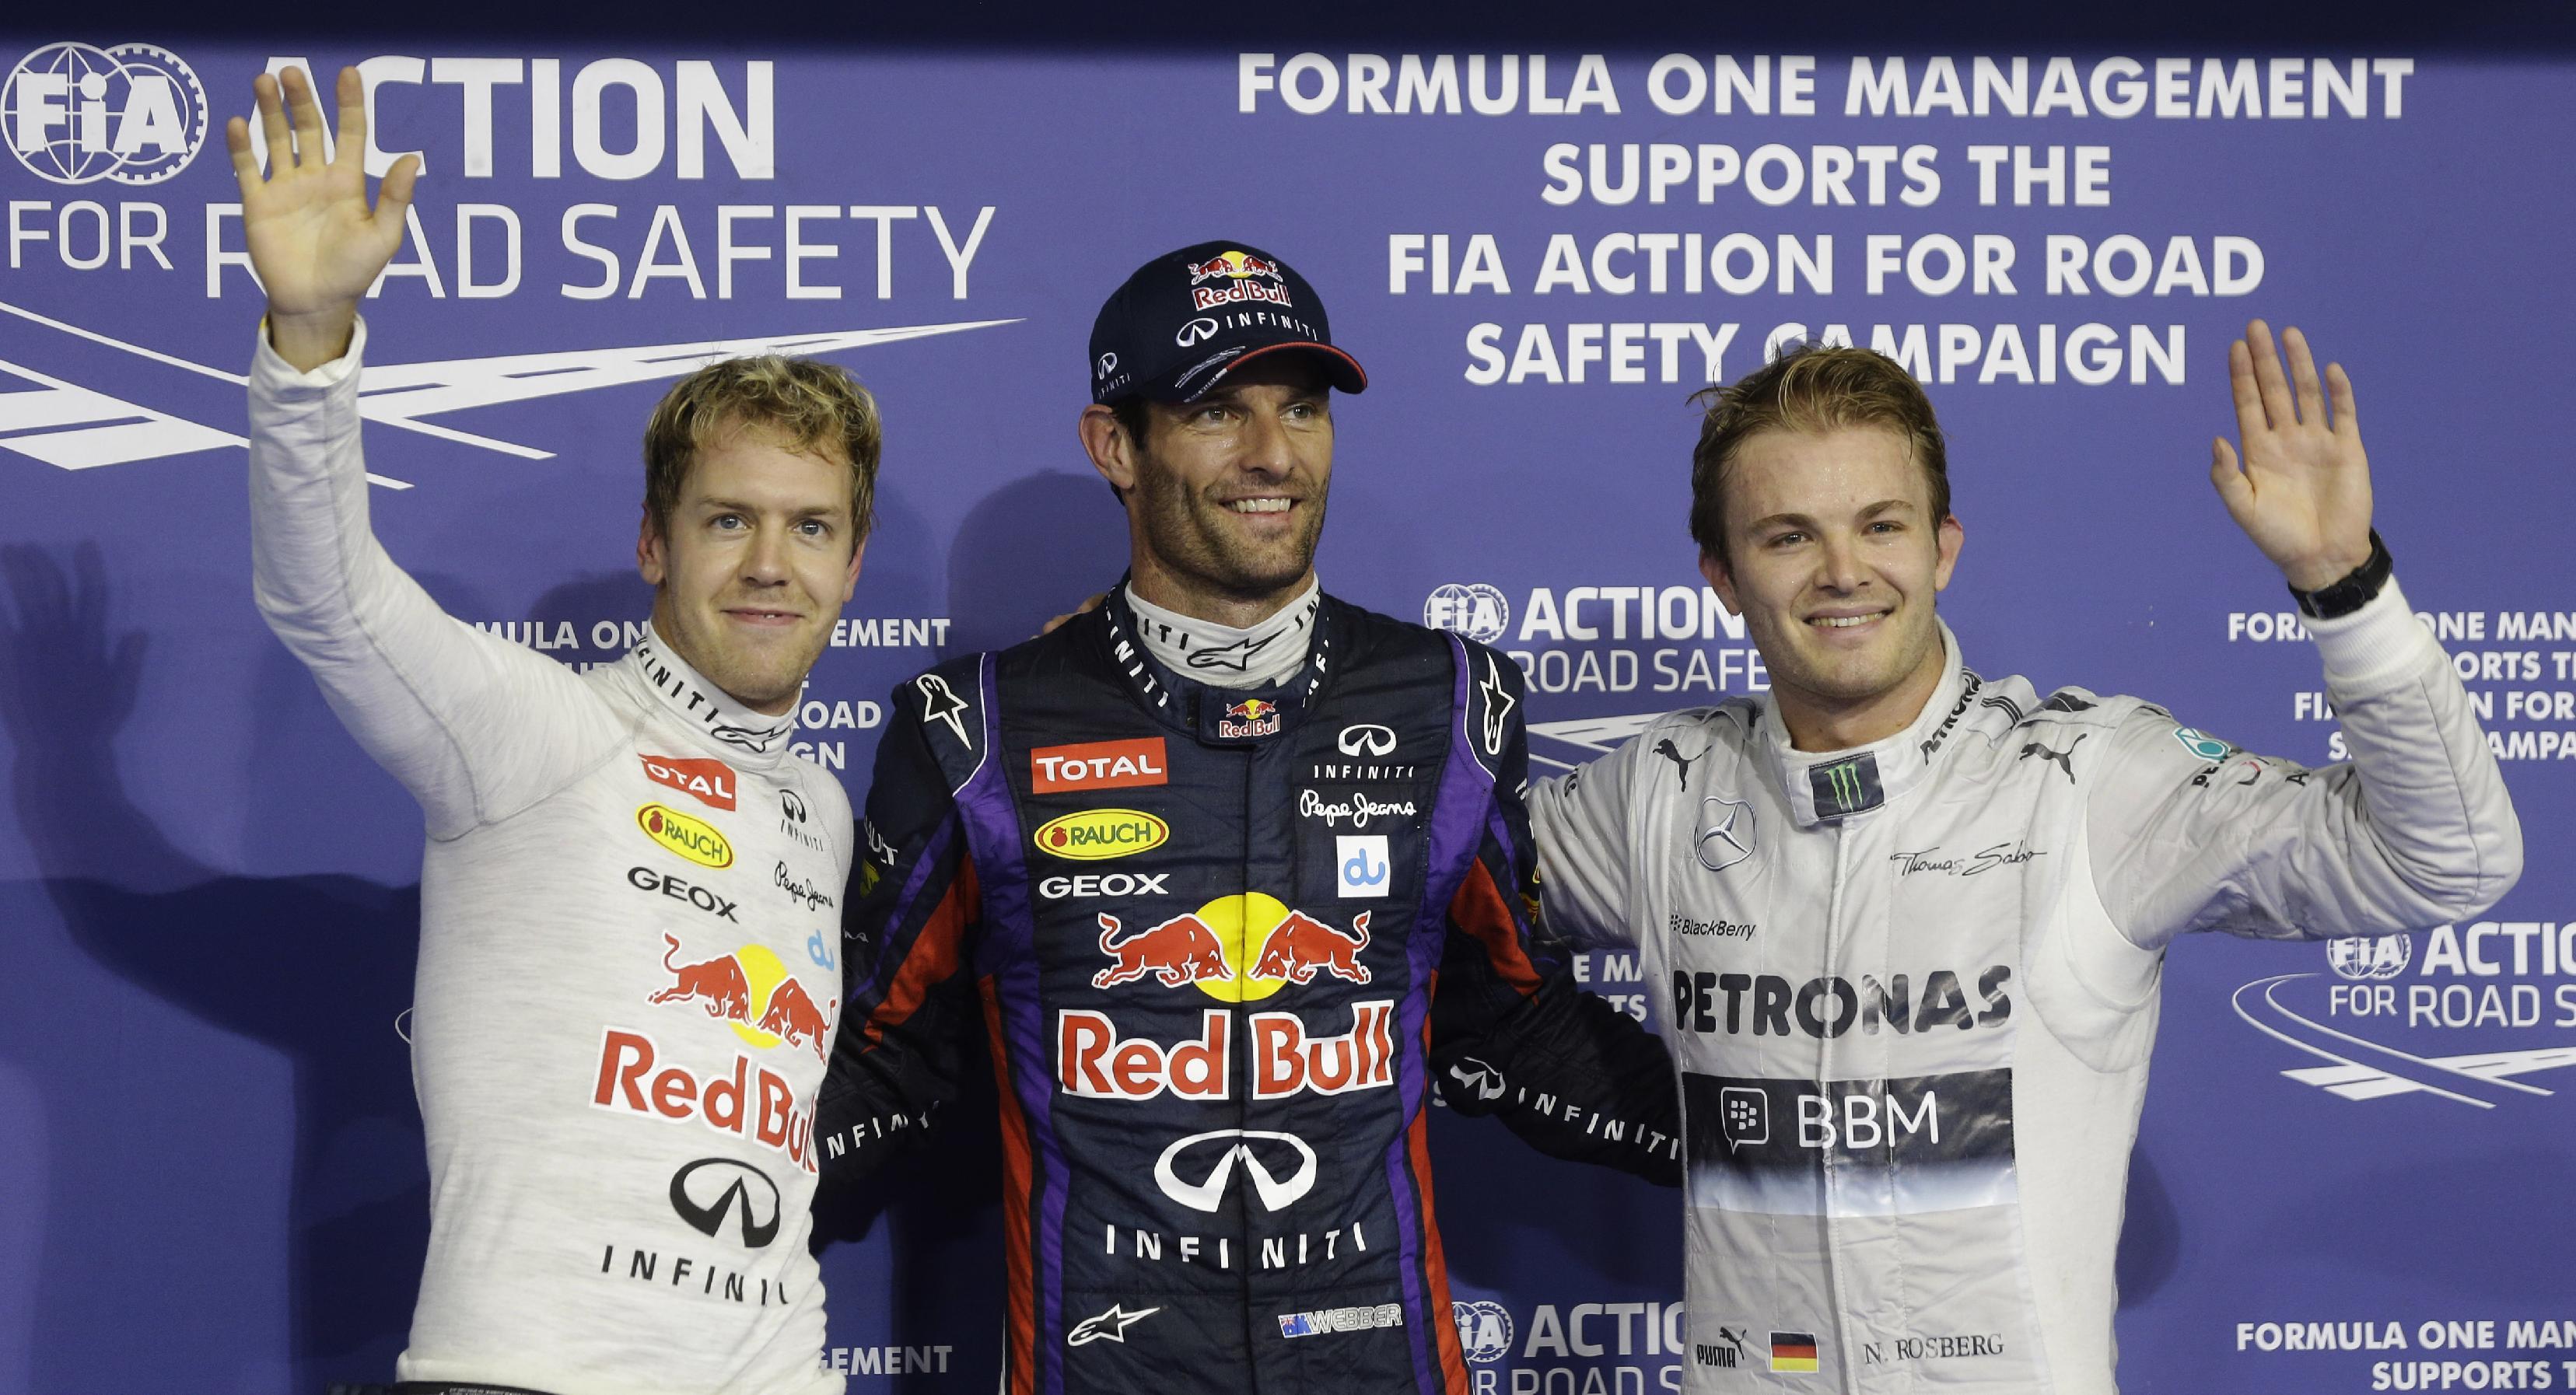 Mark Webber takes pole position at Abu Dhabi GP